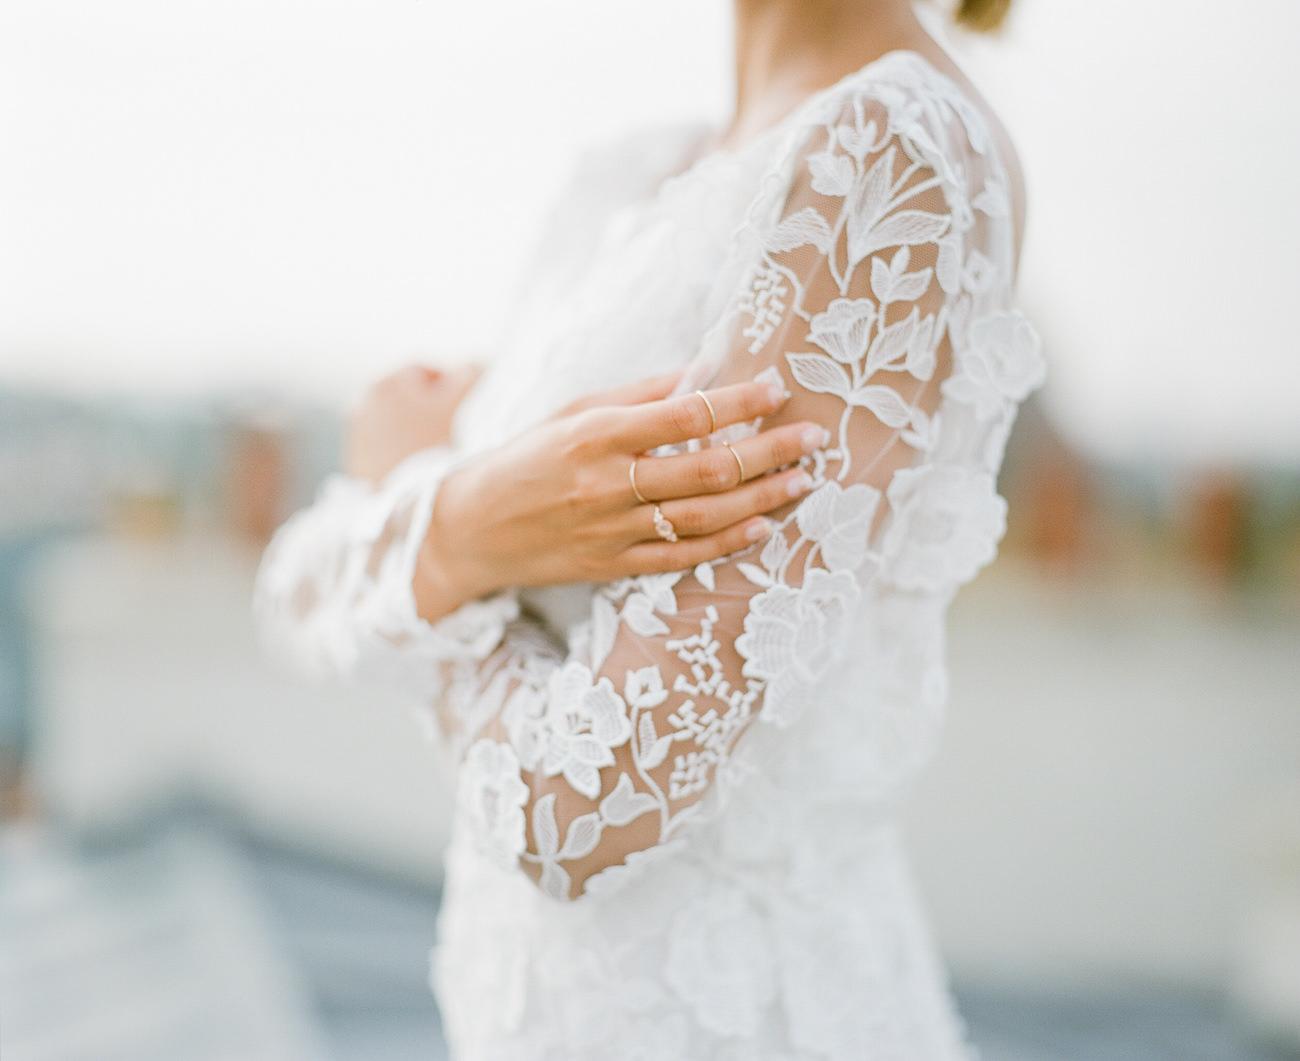 toits-paris-photographe-mariage-alain-m-4.jpg